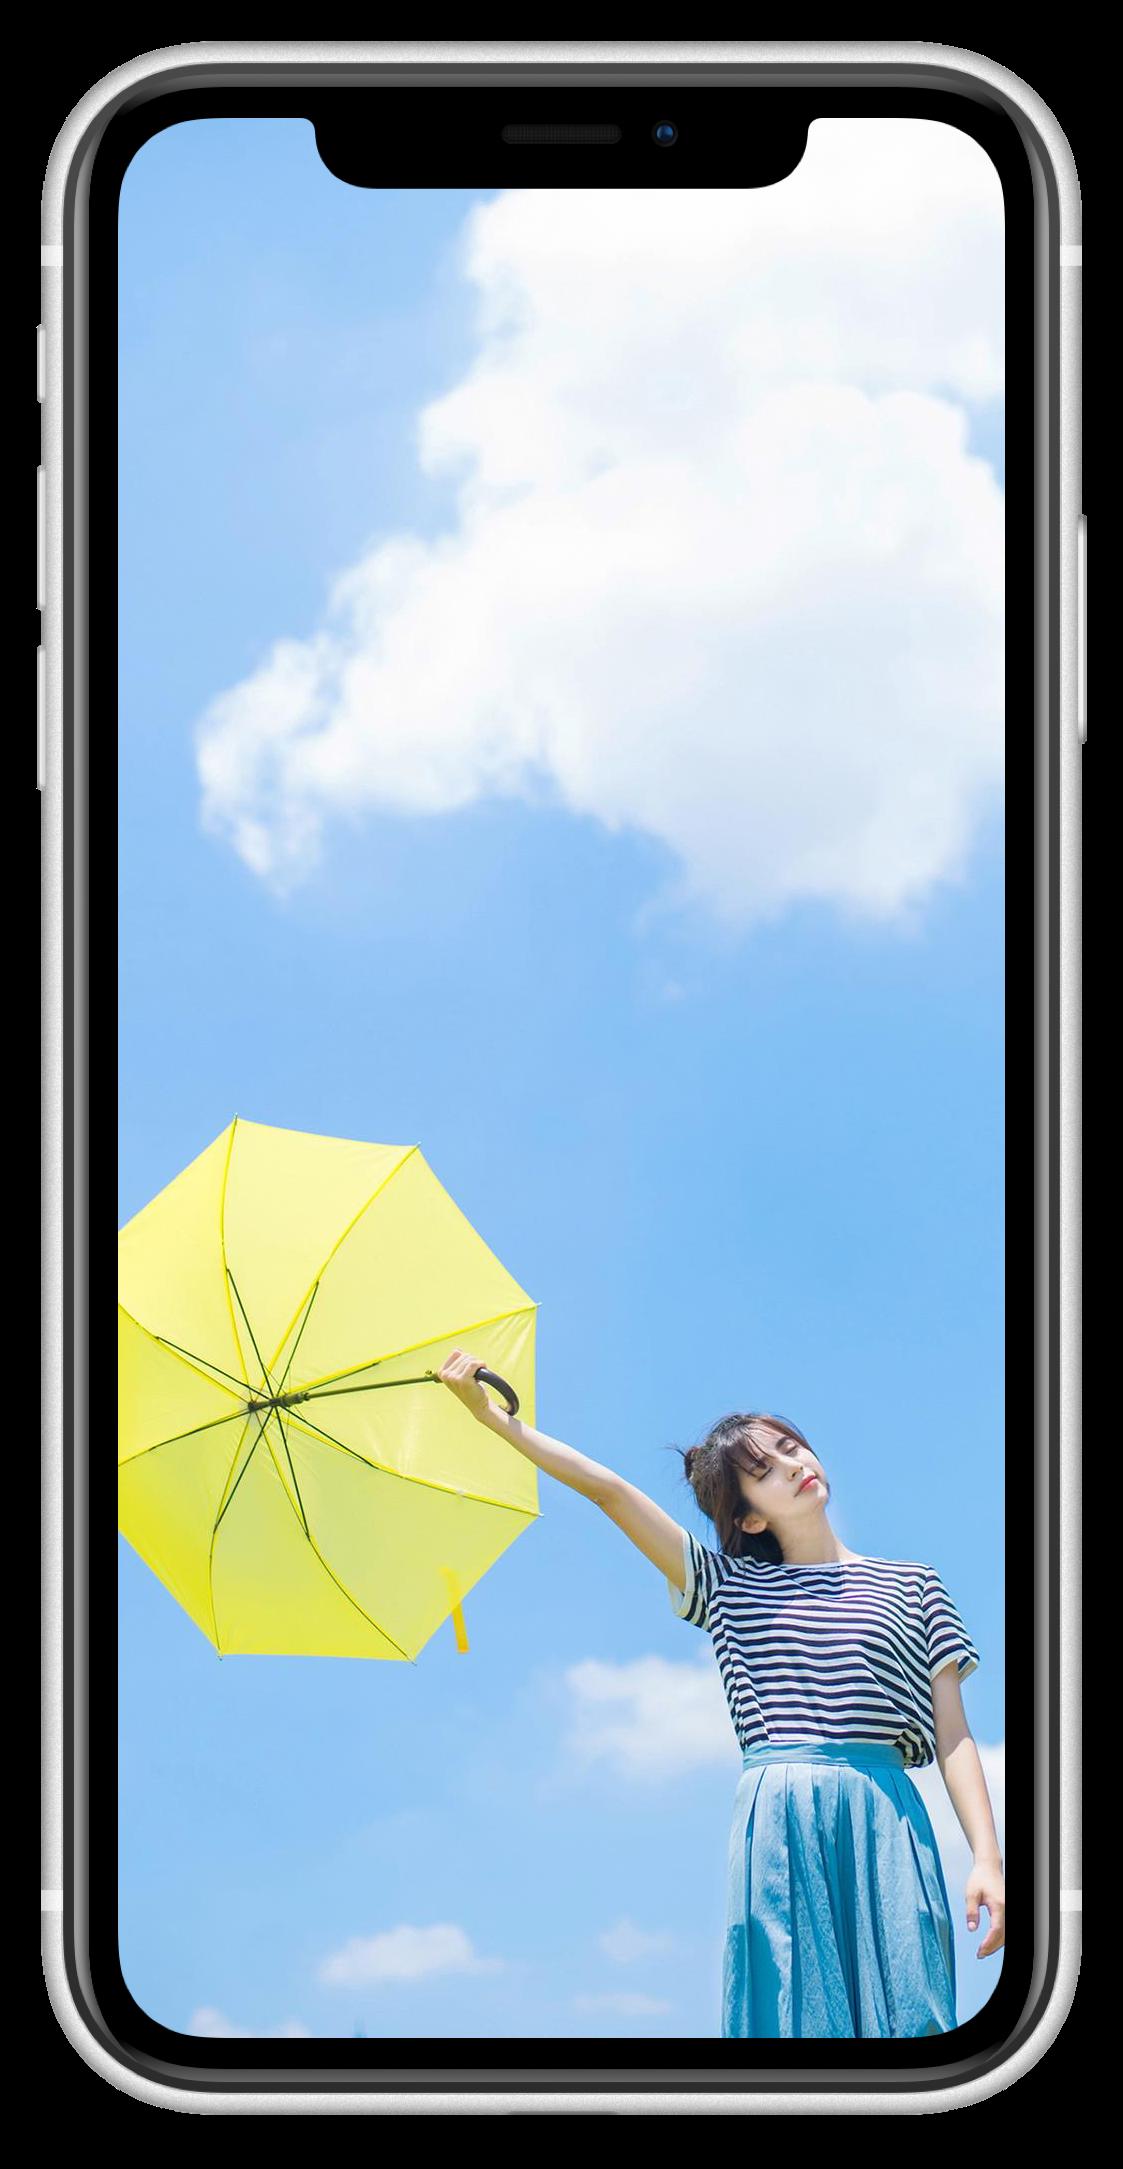 iPhone XR(我现在的手机)